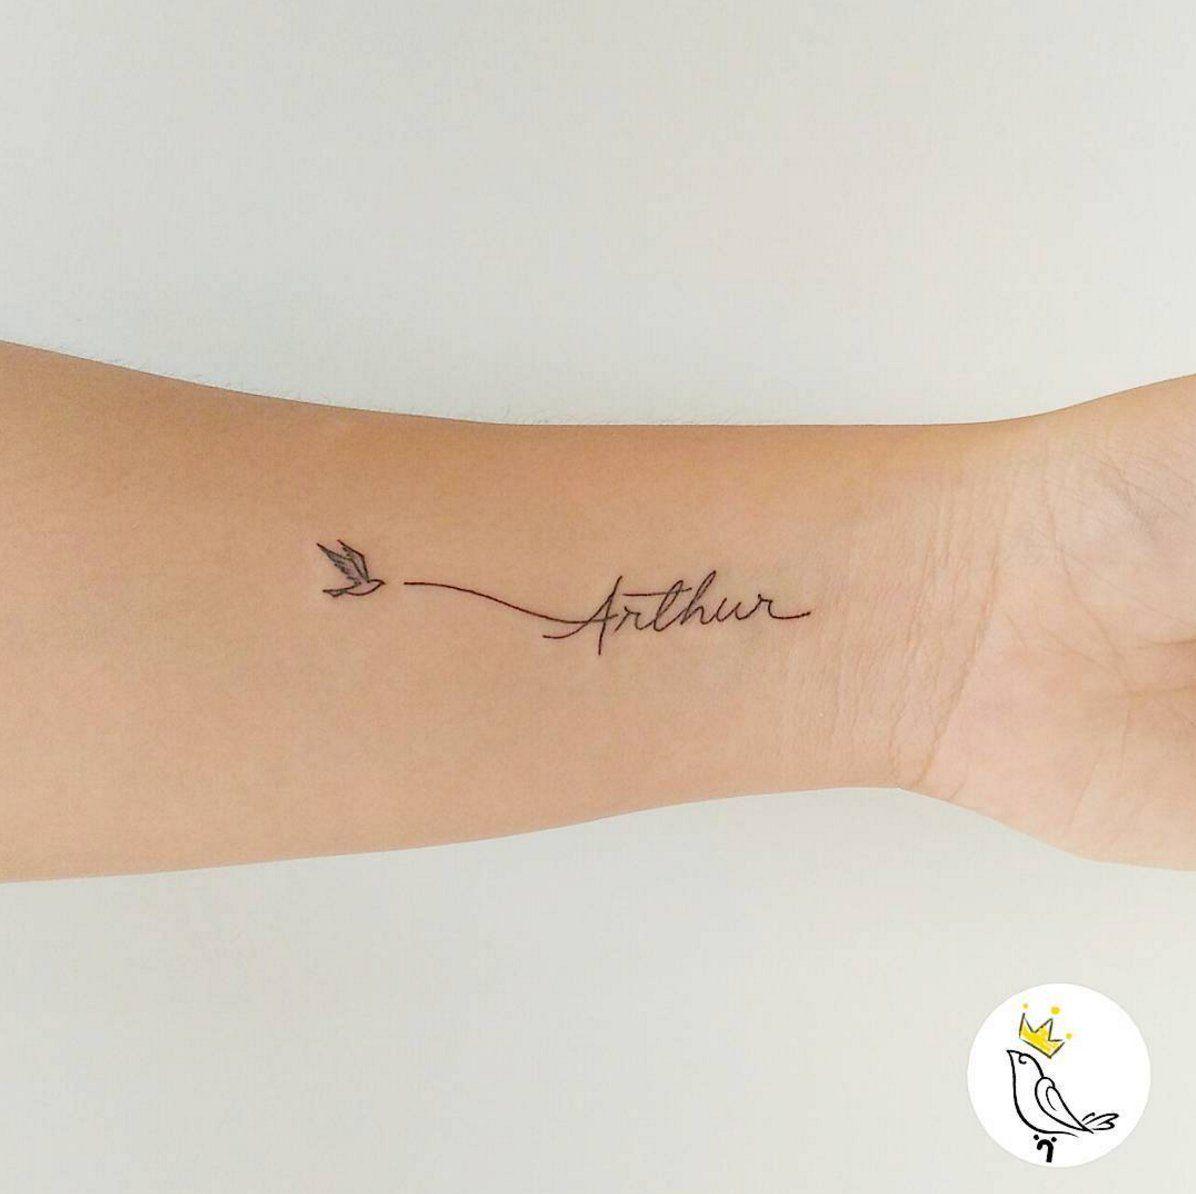 15 inspirations pour un tatouage pr nom tatouage prenom - Idee tatouage poignet ...